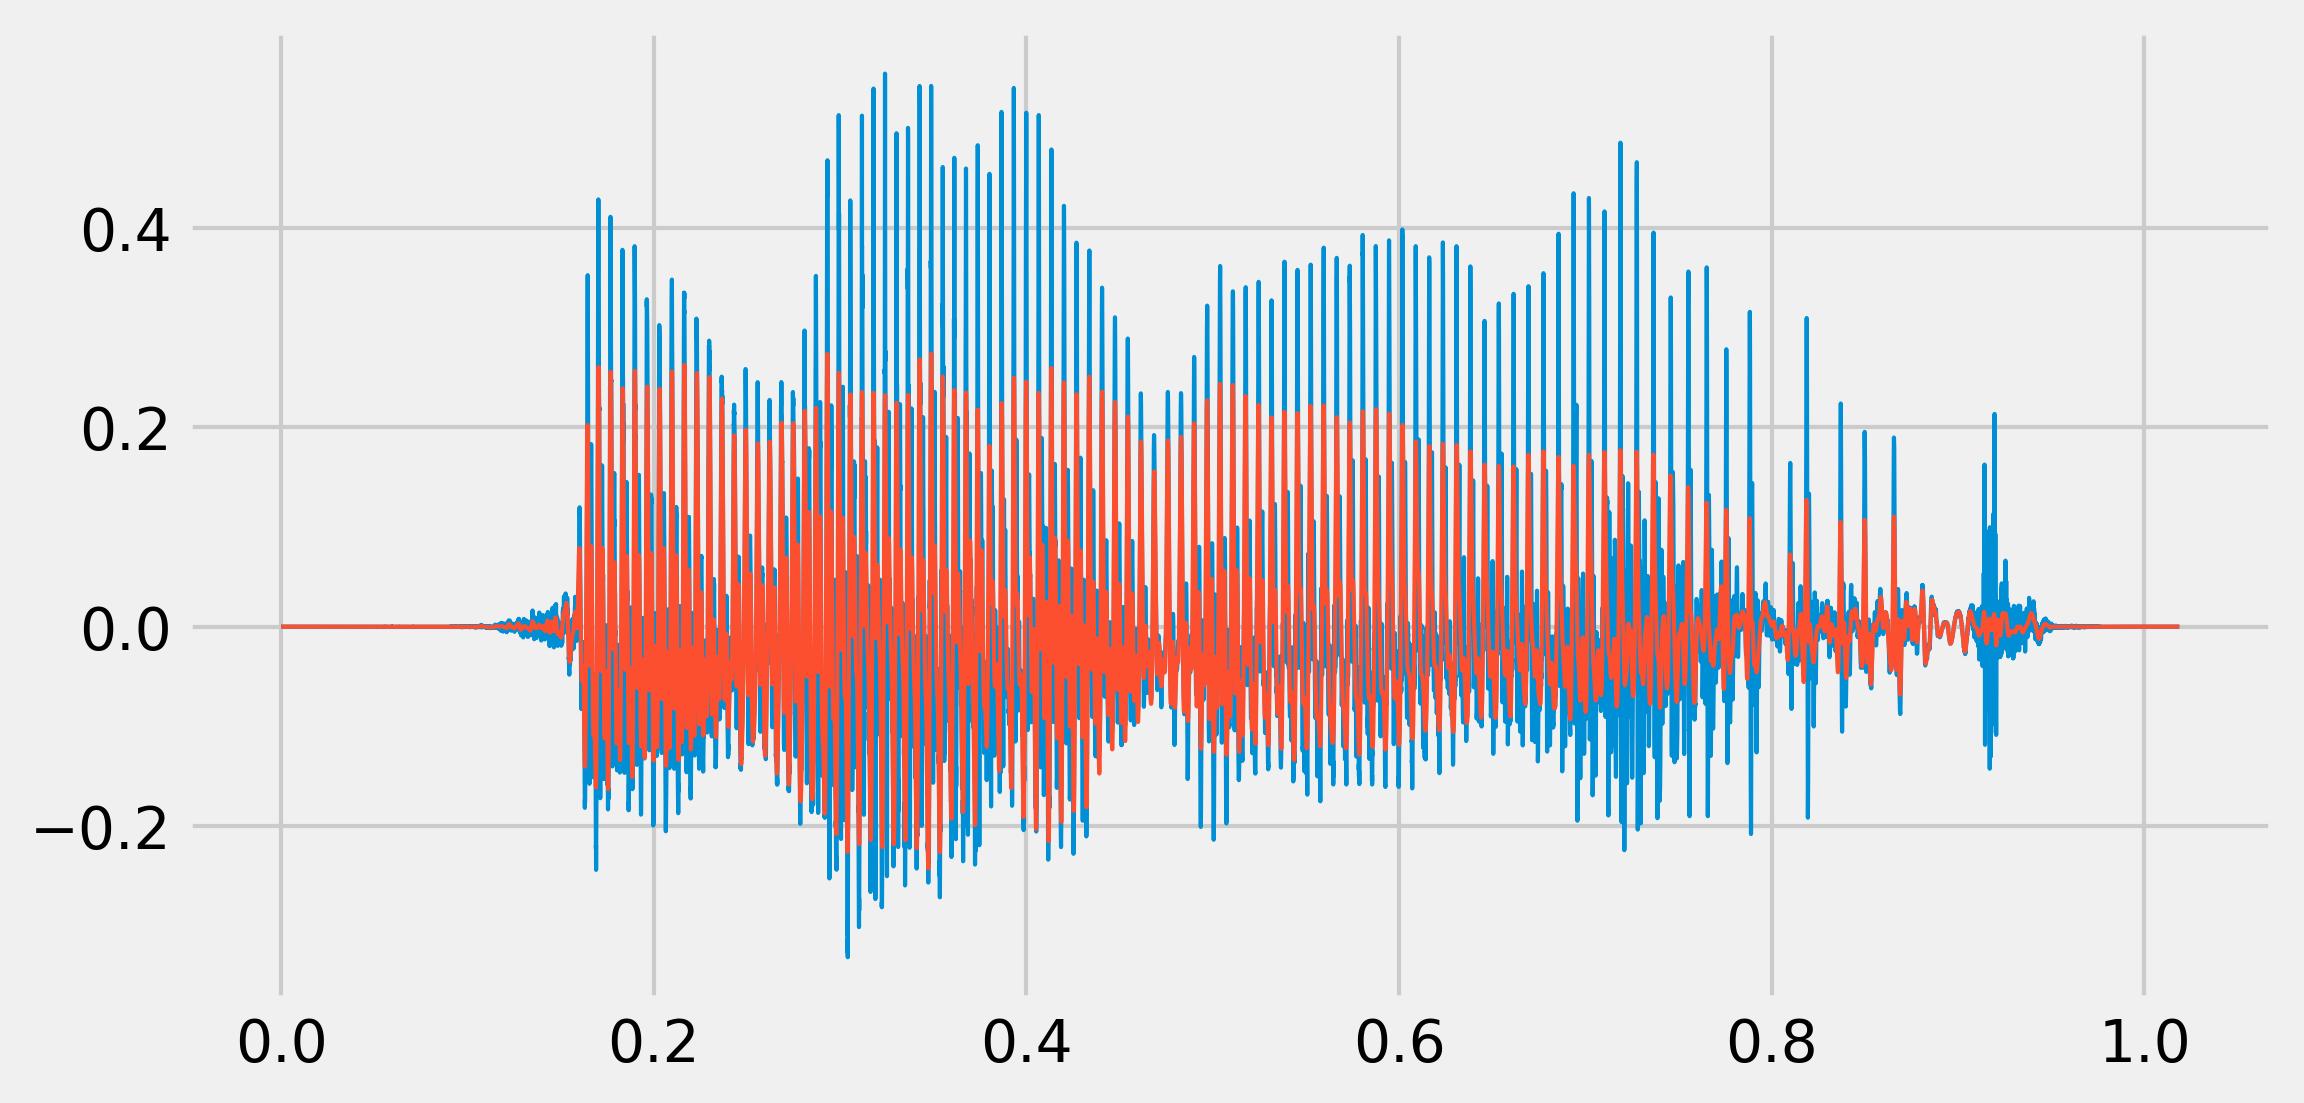 <matplotlib.figure.Figure at 0x4865470>